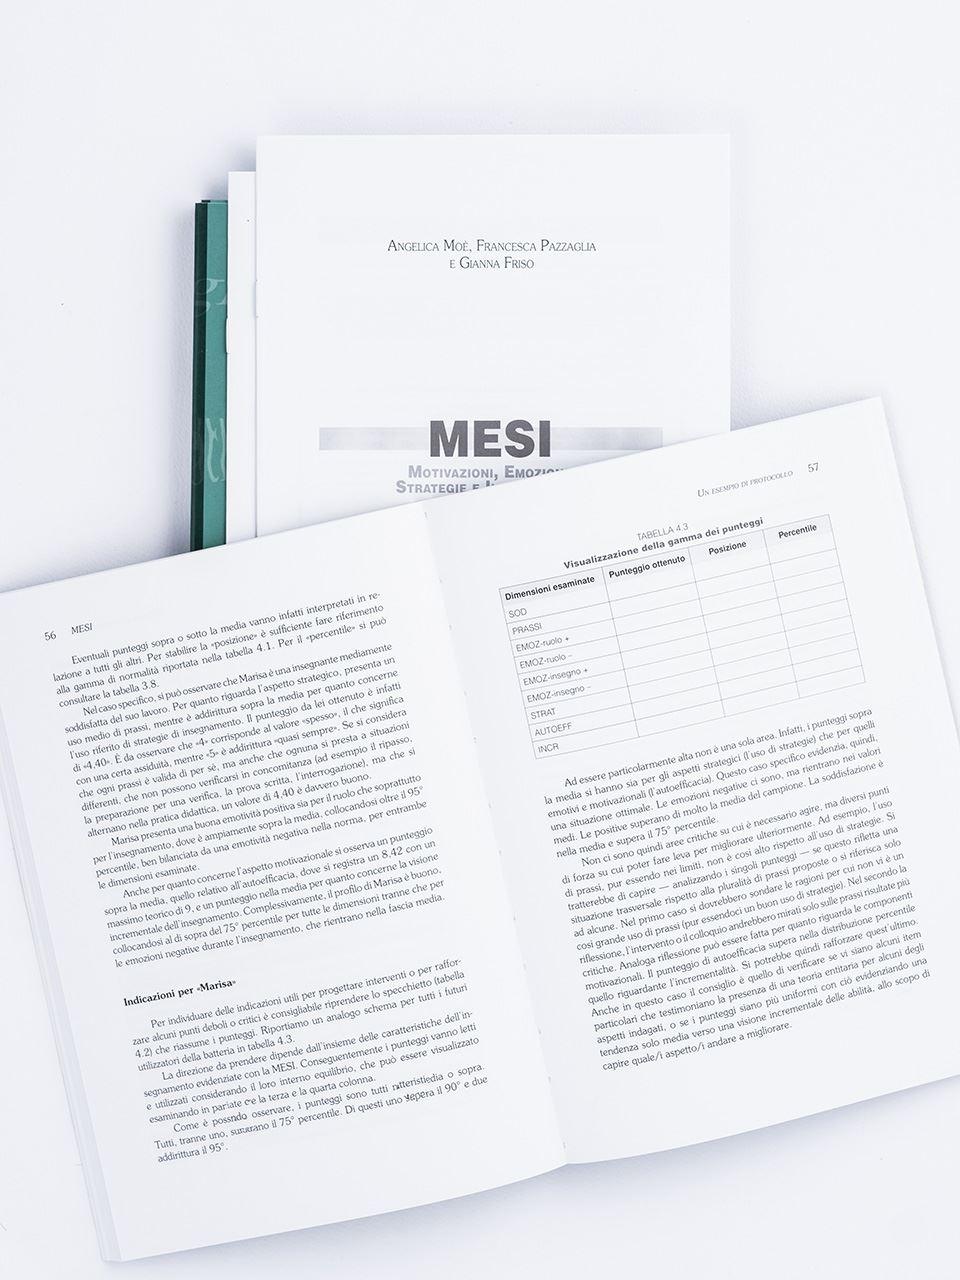 MESI - Motivazioni, Emozioni, Strategie e Insegnam - Libri - Erickson 2